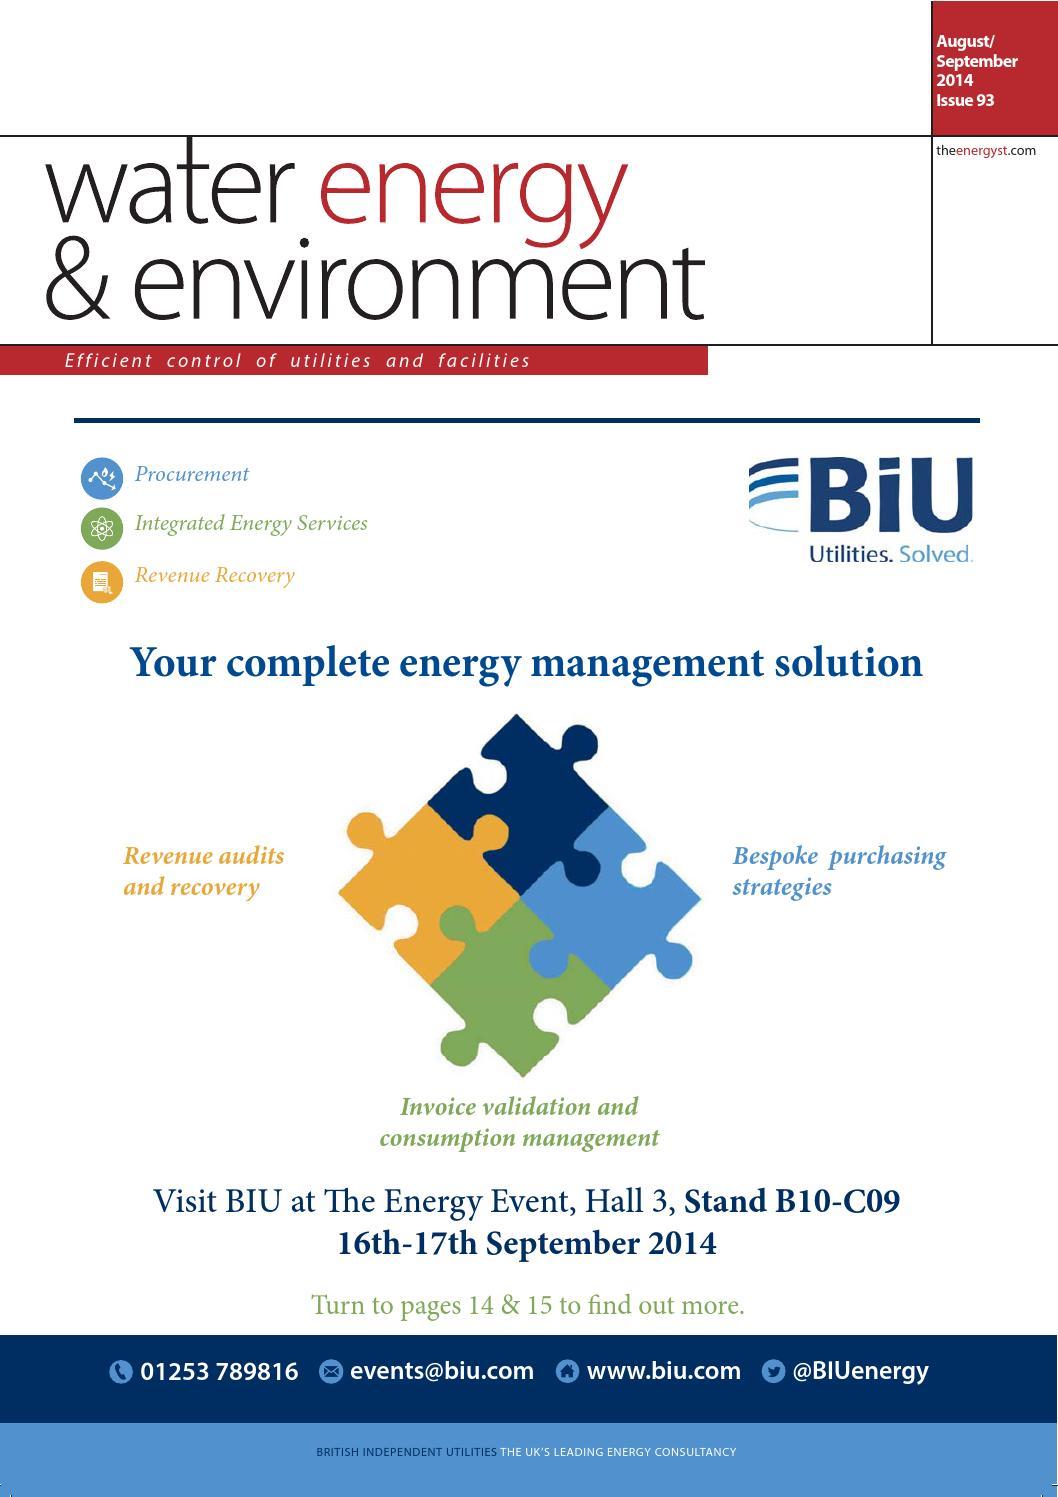 Water Energy Environment By Energyst Media Ltd Issuu